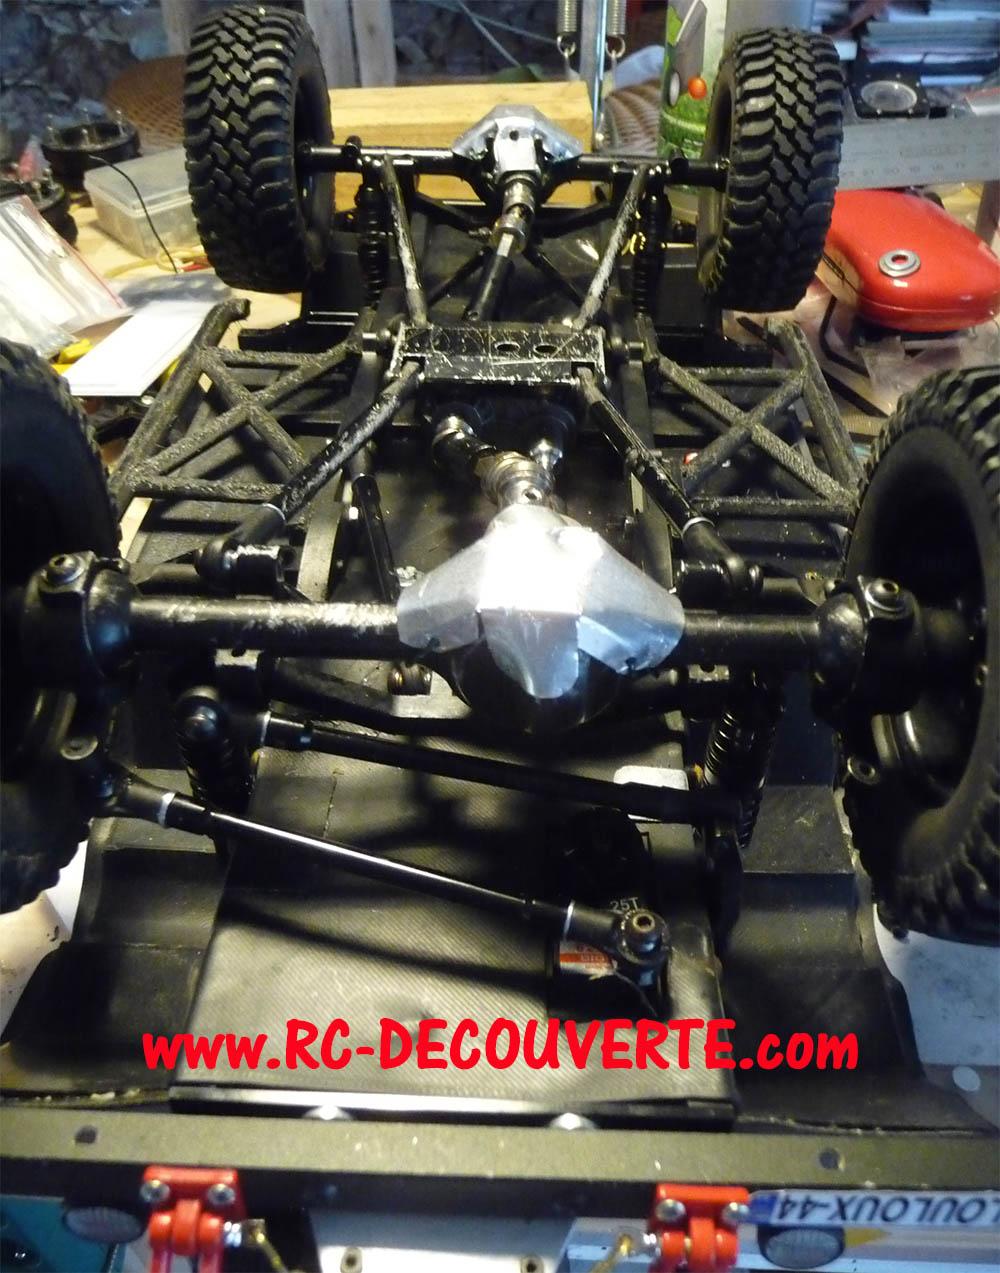 Rc4wd Gelande 2 Land Rover Defender D90 : Présentation et Modification - Page 7 D90-ge14